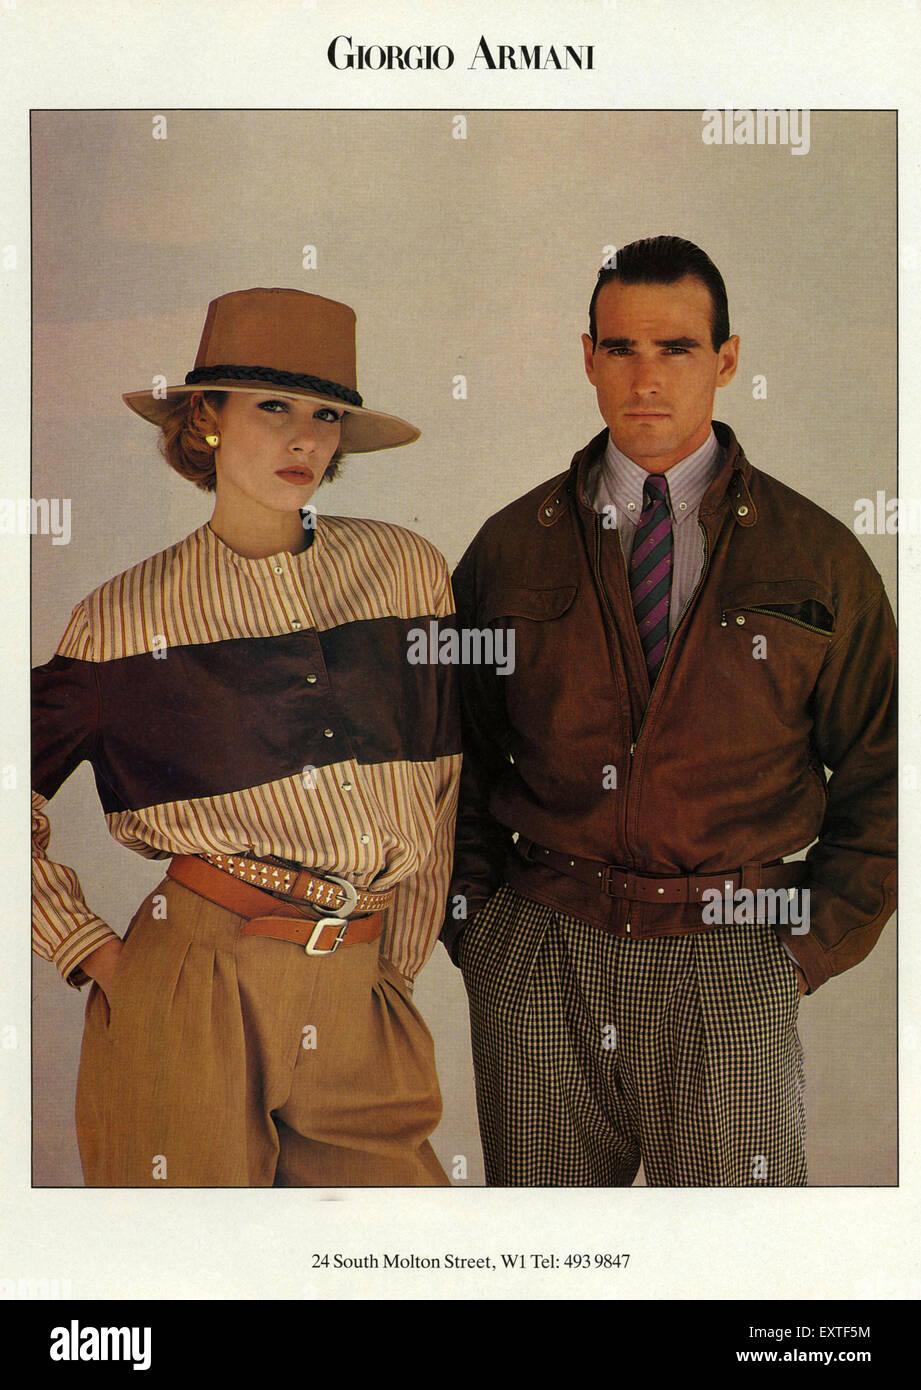 1980s Uk Armani Magazine Advert Imágenes De Stock & 1980s Uk